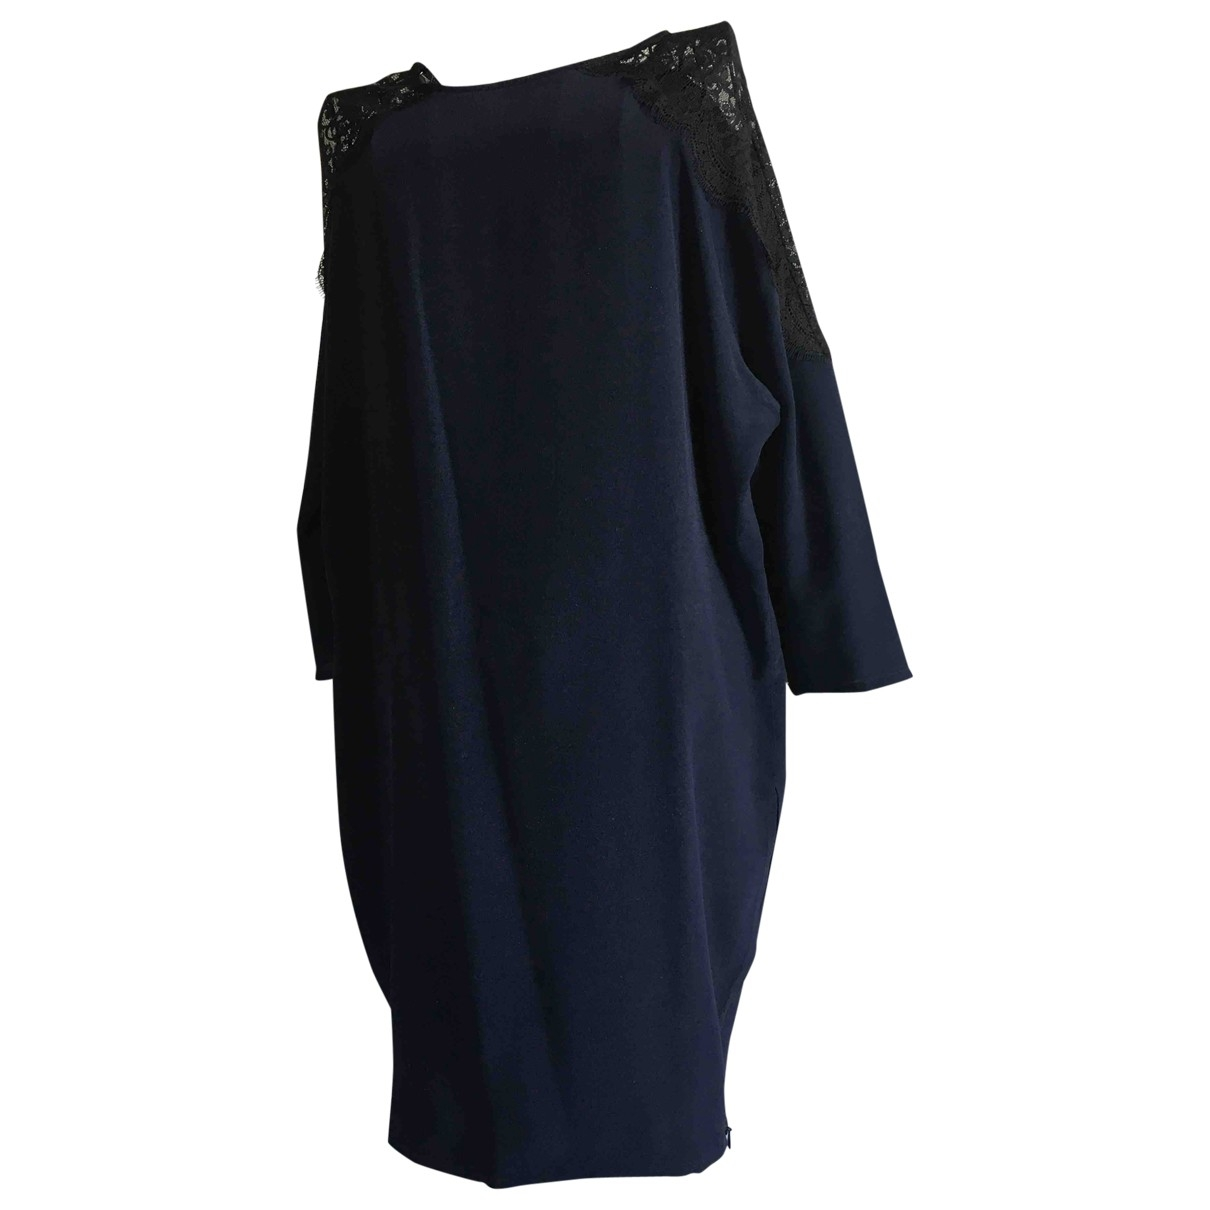 Patrizia Pepe \N Blue Silk dress for Women 42 IT